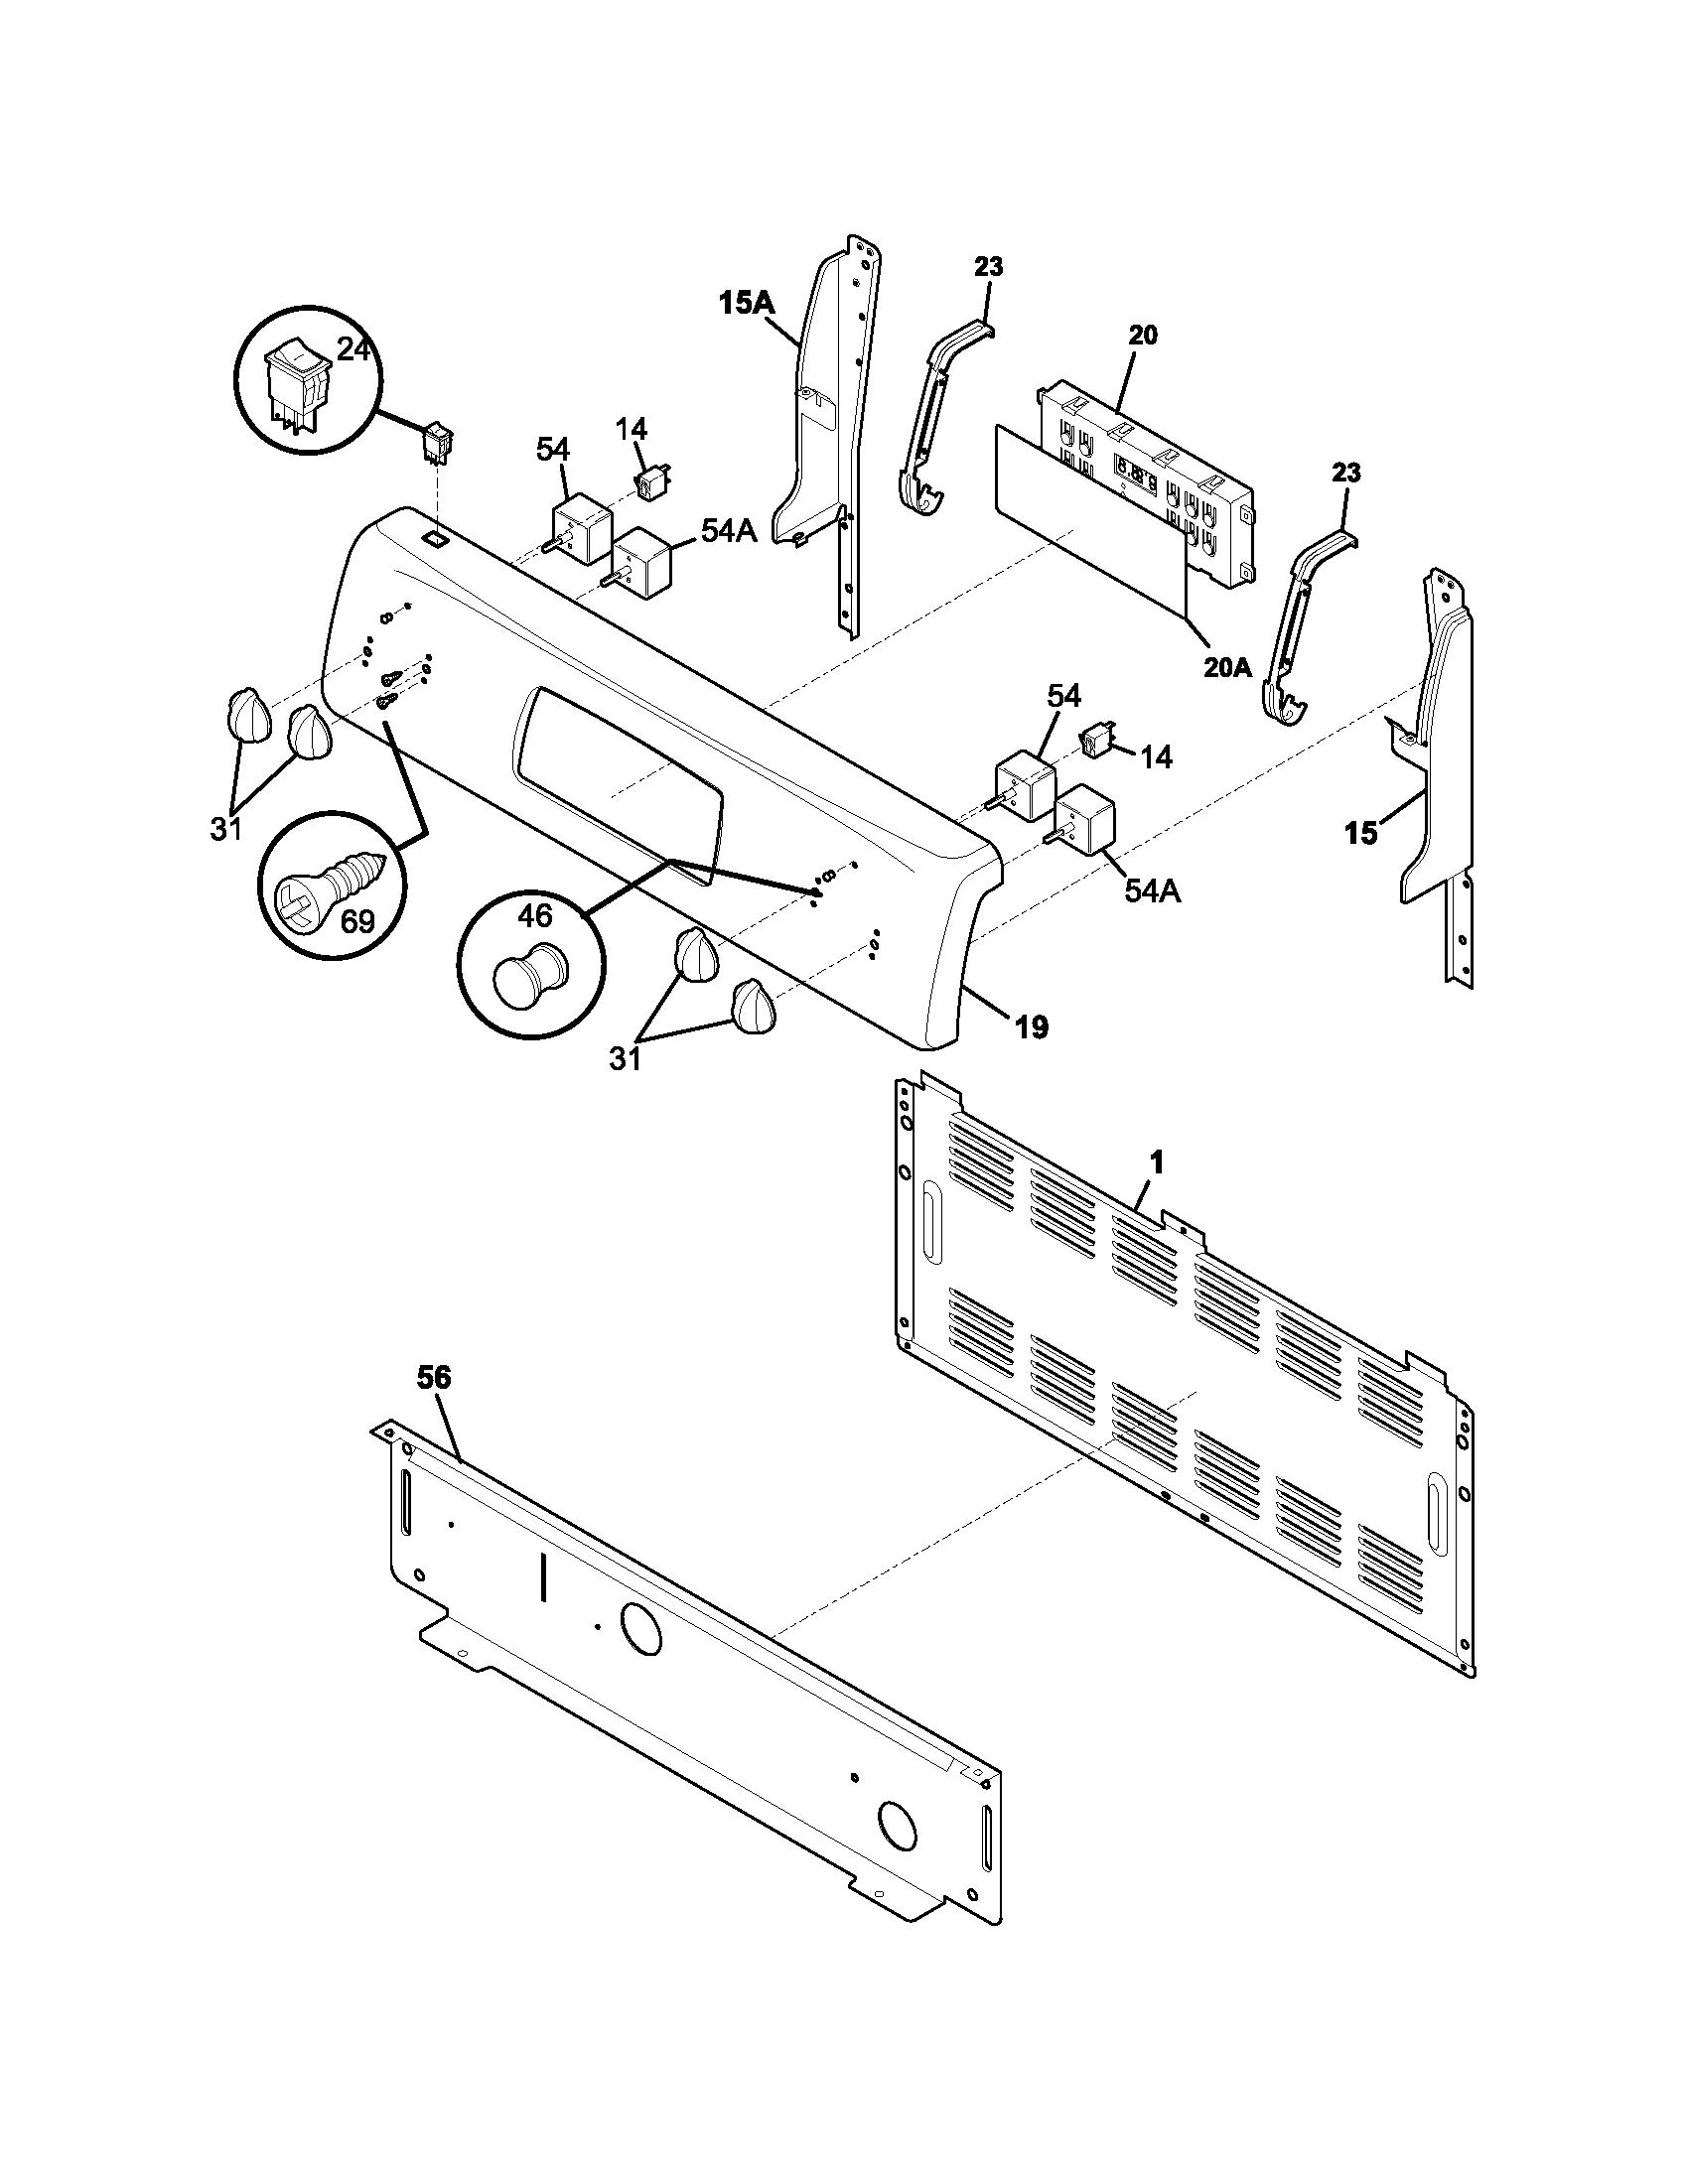 hight resolution of kelvinator kef355asj backguard diagram